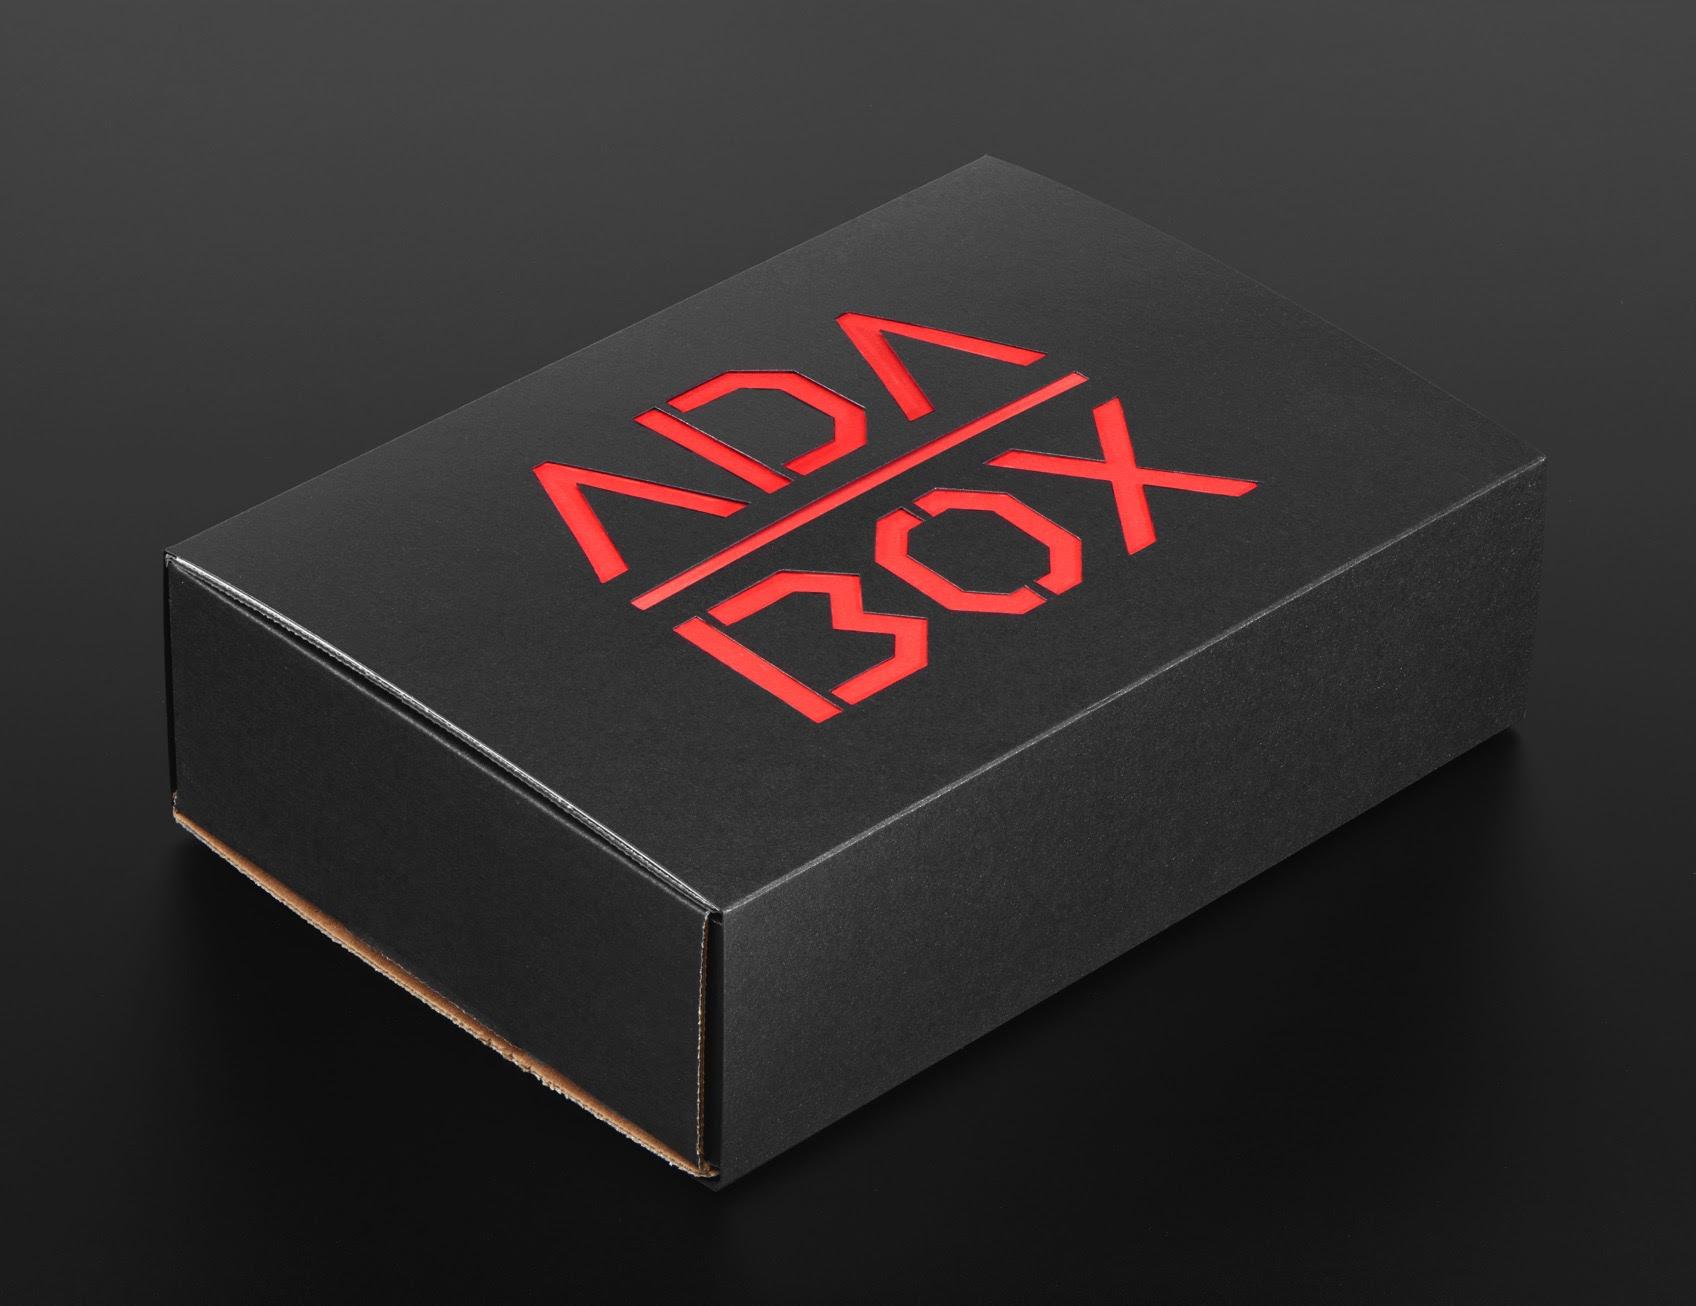 Adabox 03 iso box ORIG